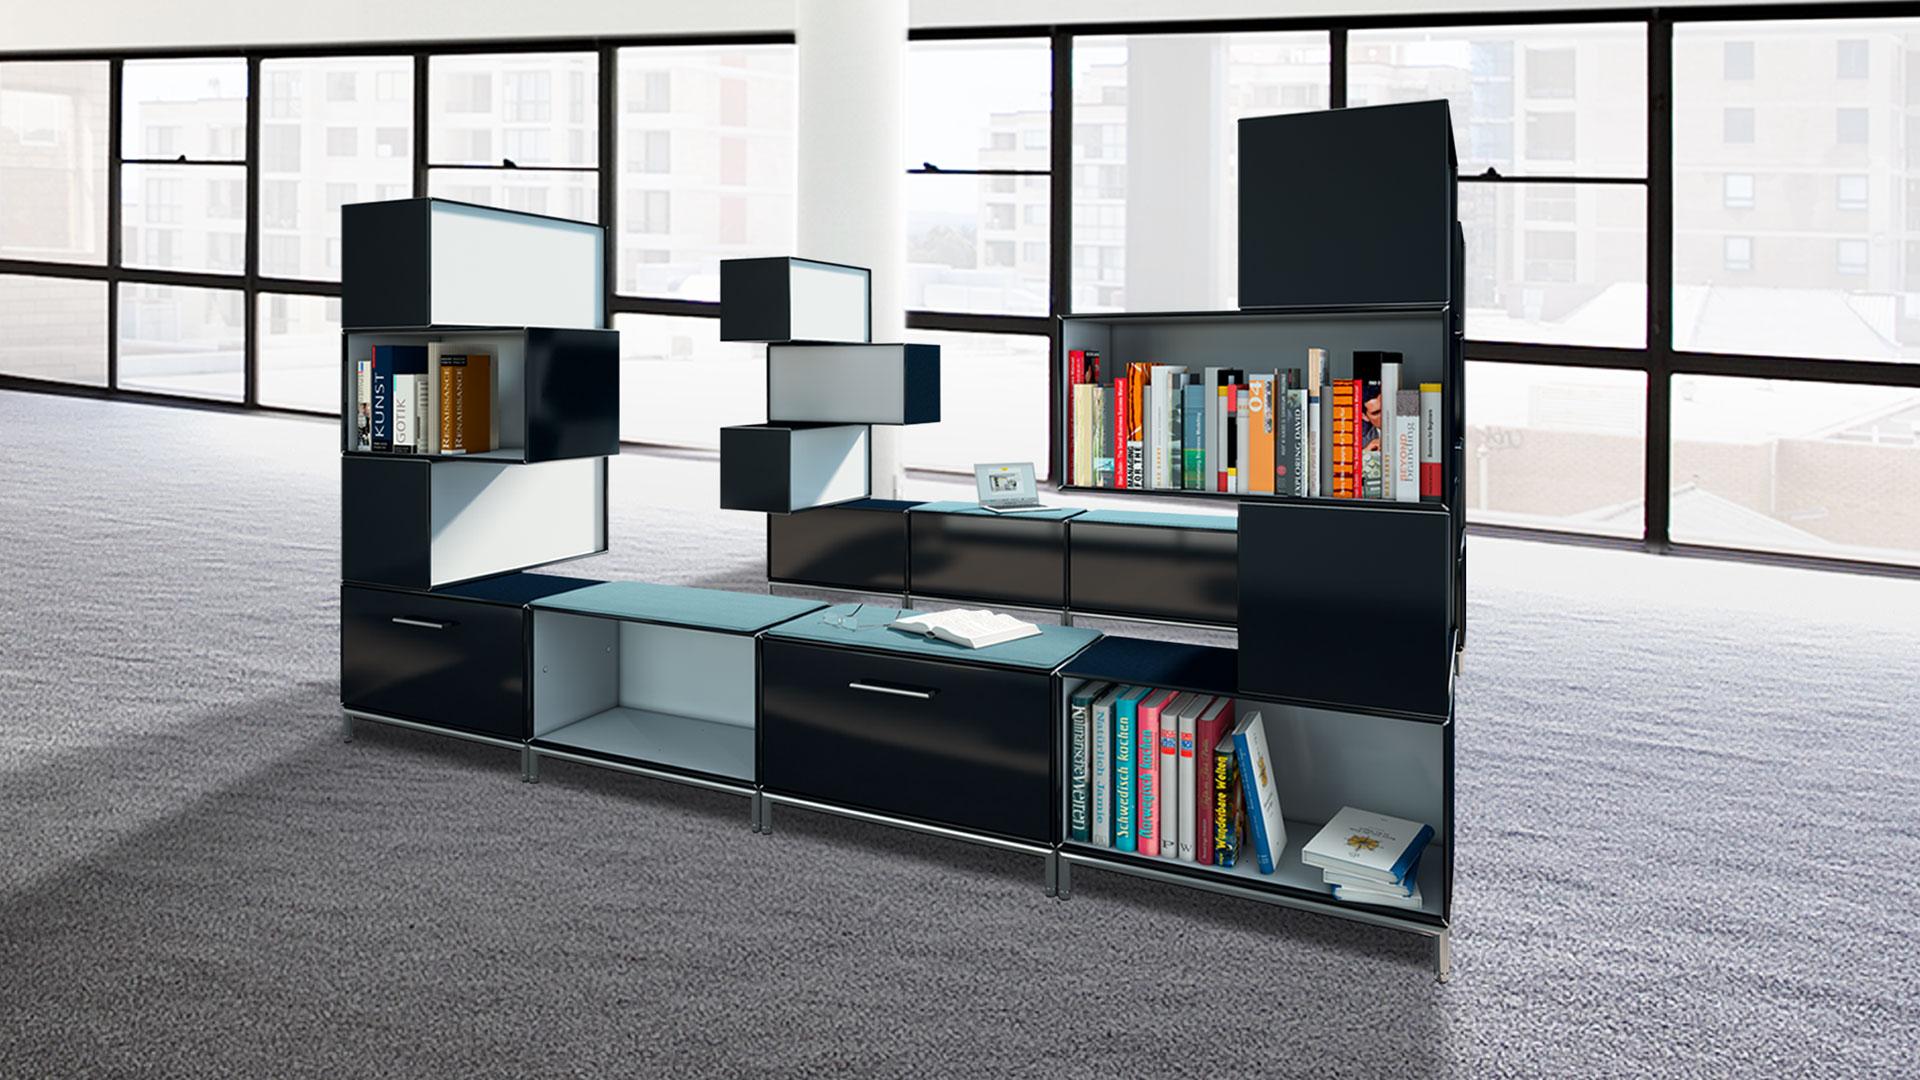 Design-Moebel-Stauraum-Bibliothek-element-x-mauser-16-94sgPaTy66xADC